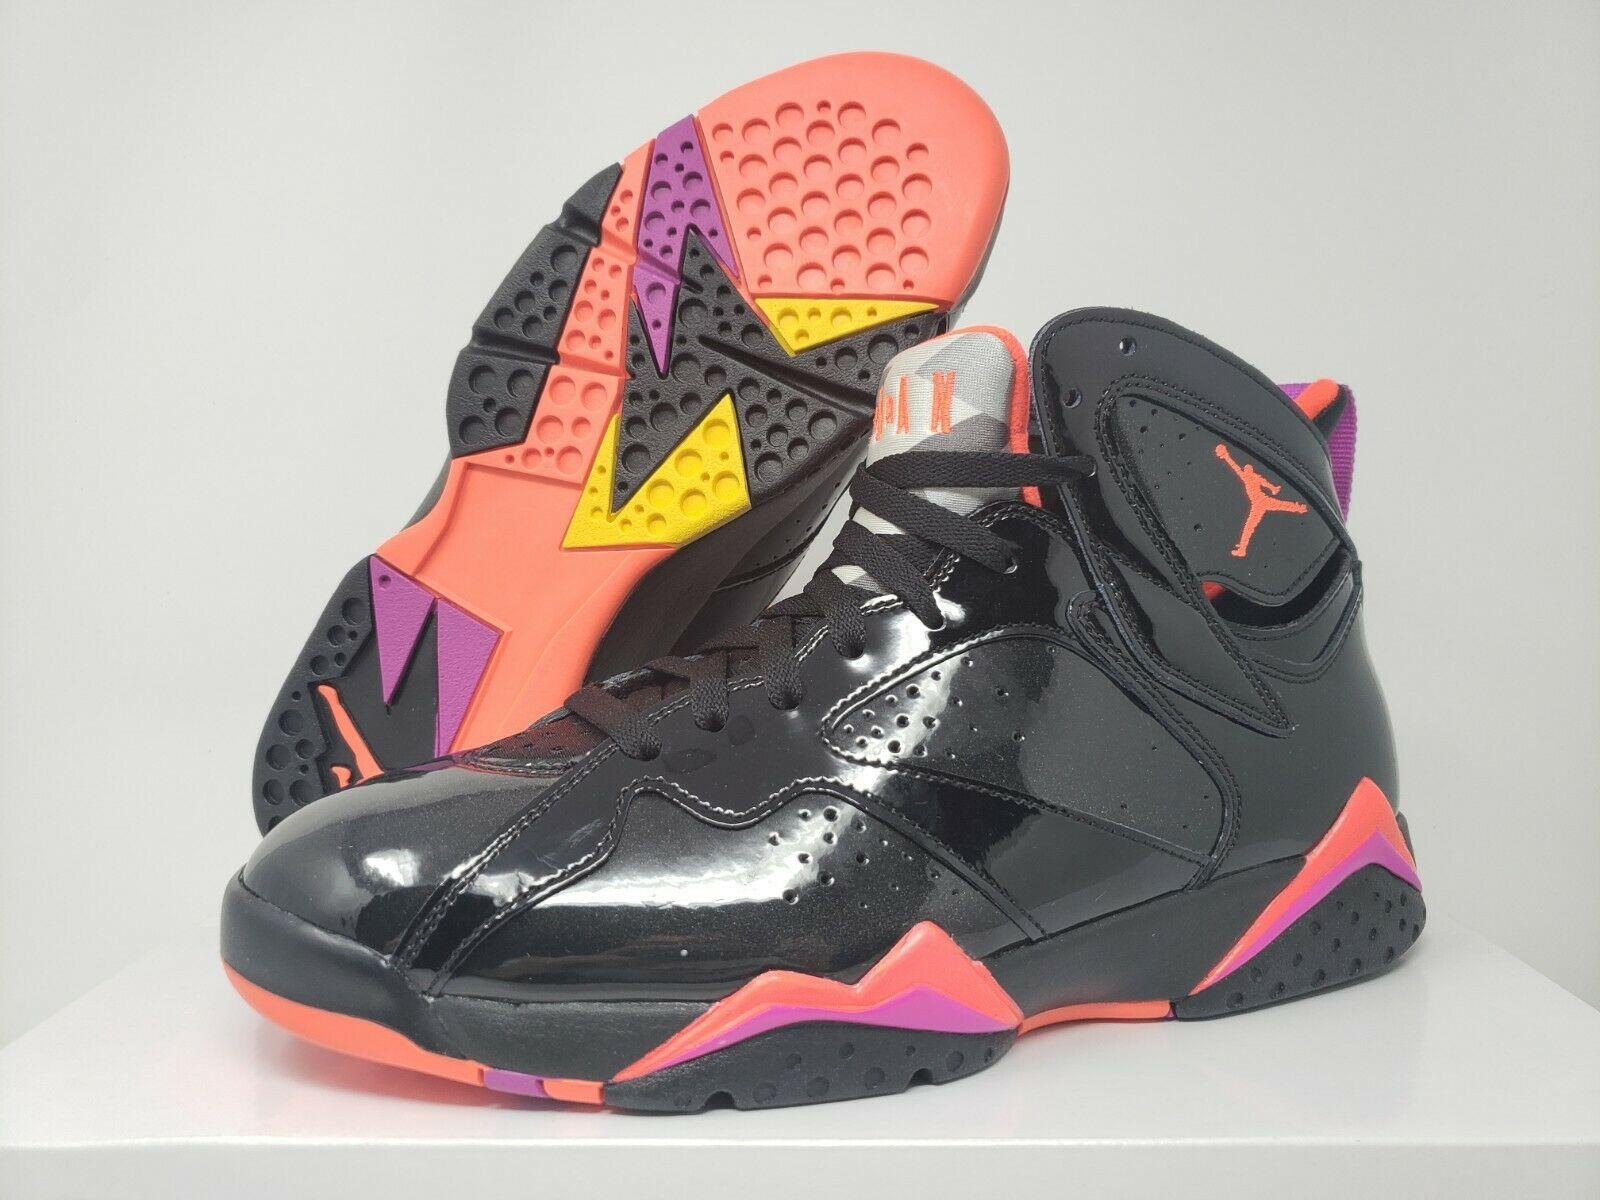 Jordan 7 Retro Black Patent W